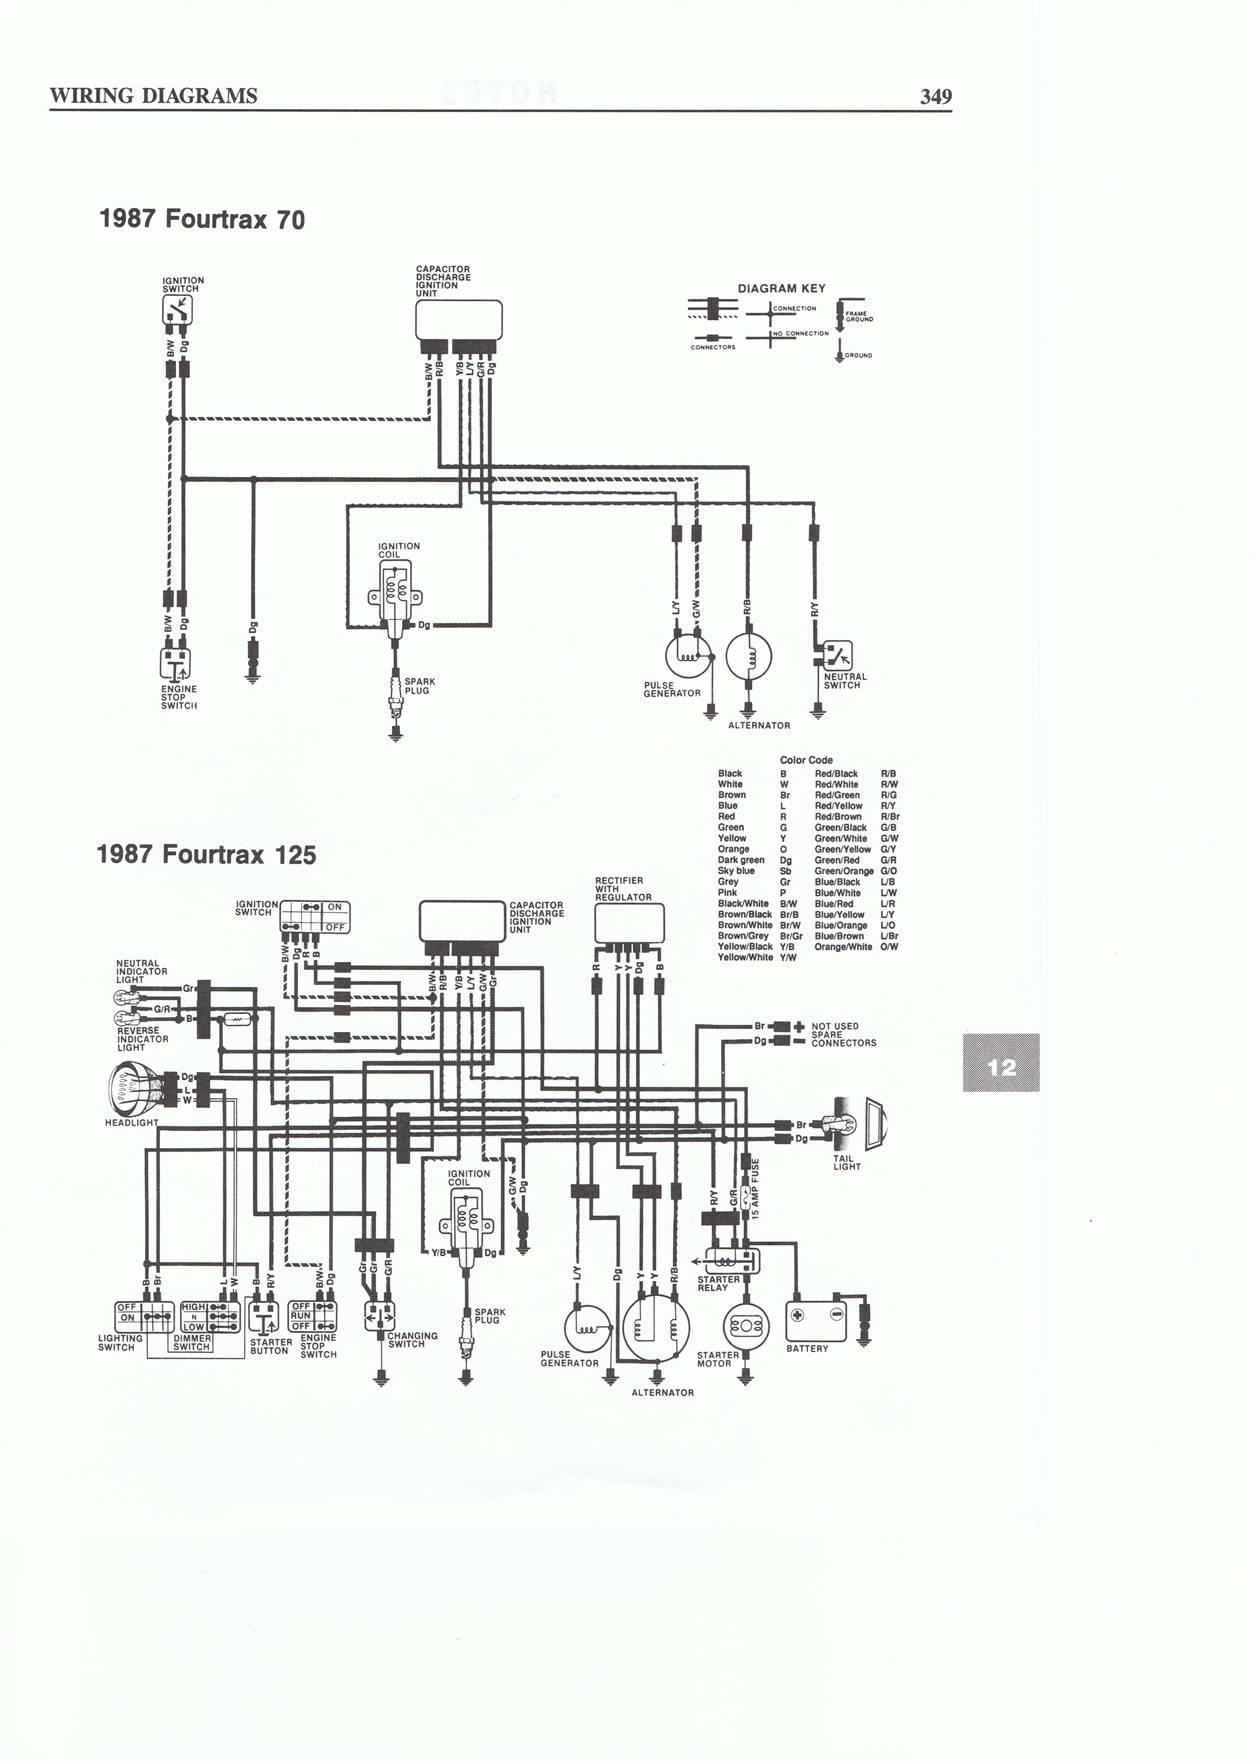 gy6 engine wiring diagram?t\\\=1398725710 taotao ata 110 wiring diagram 12v led wiring diagram \u2022 free wiring 2000 Eton 90 ATV at readyjetset.co